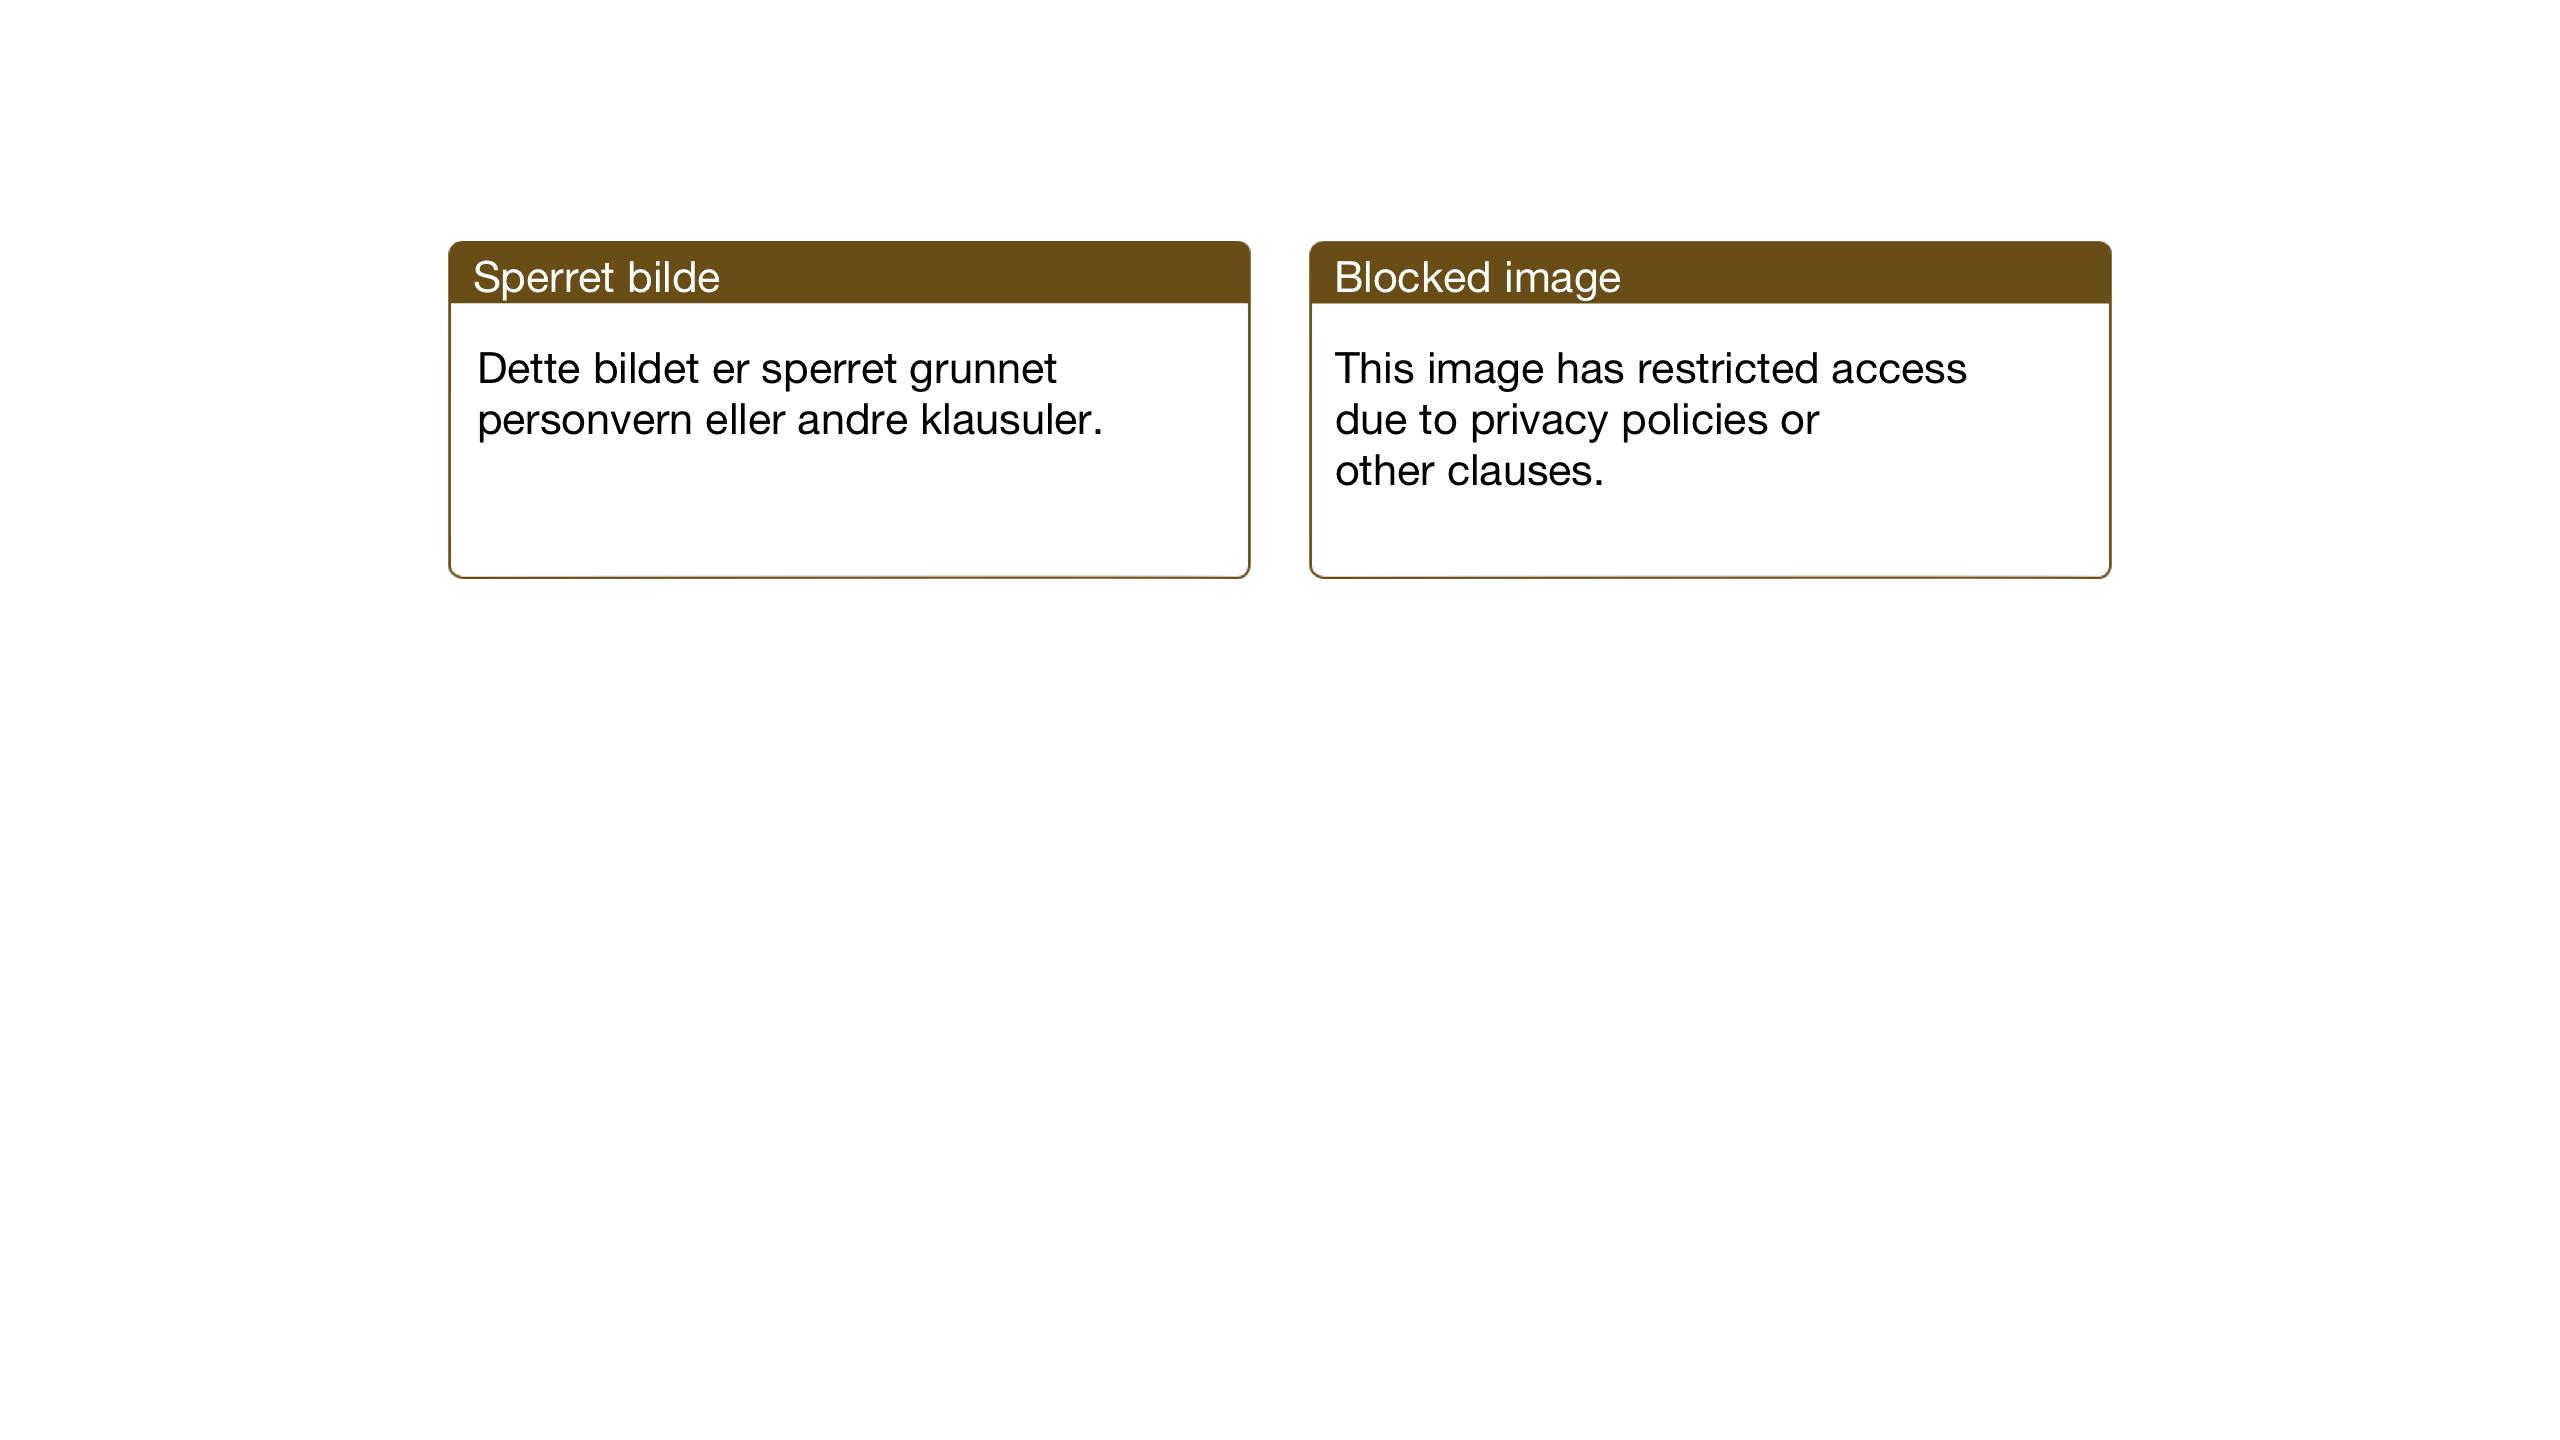 SAH, Vardal prestekontor, H/Ha/Haa/L0018: Ministerialbok nr. 18, 1930-1945, s. 53